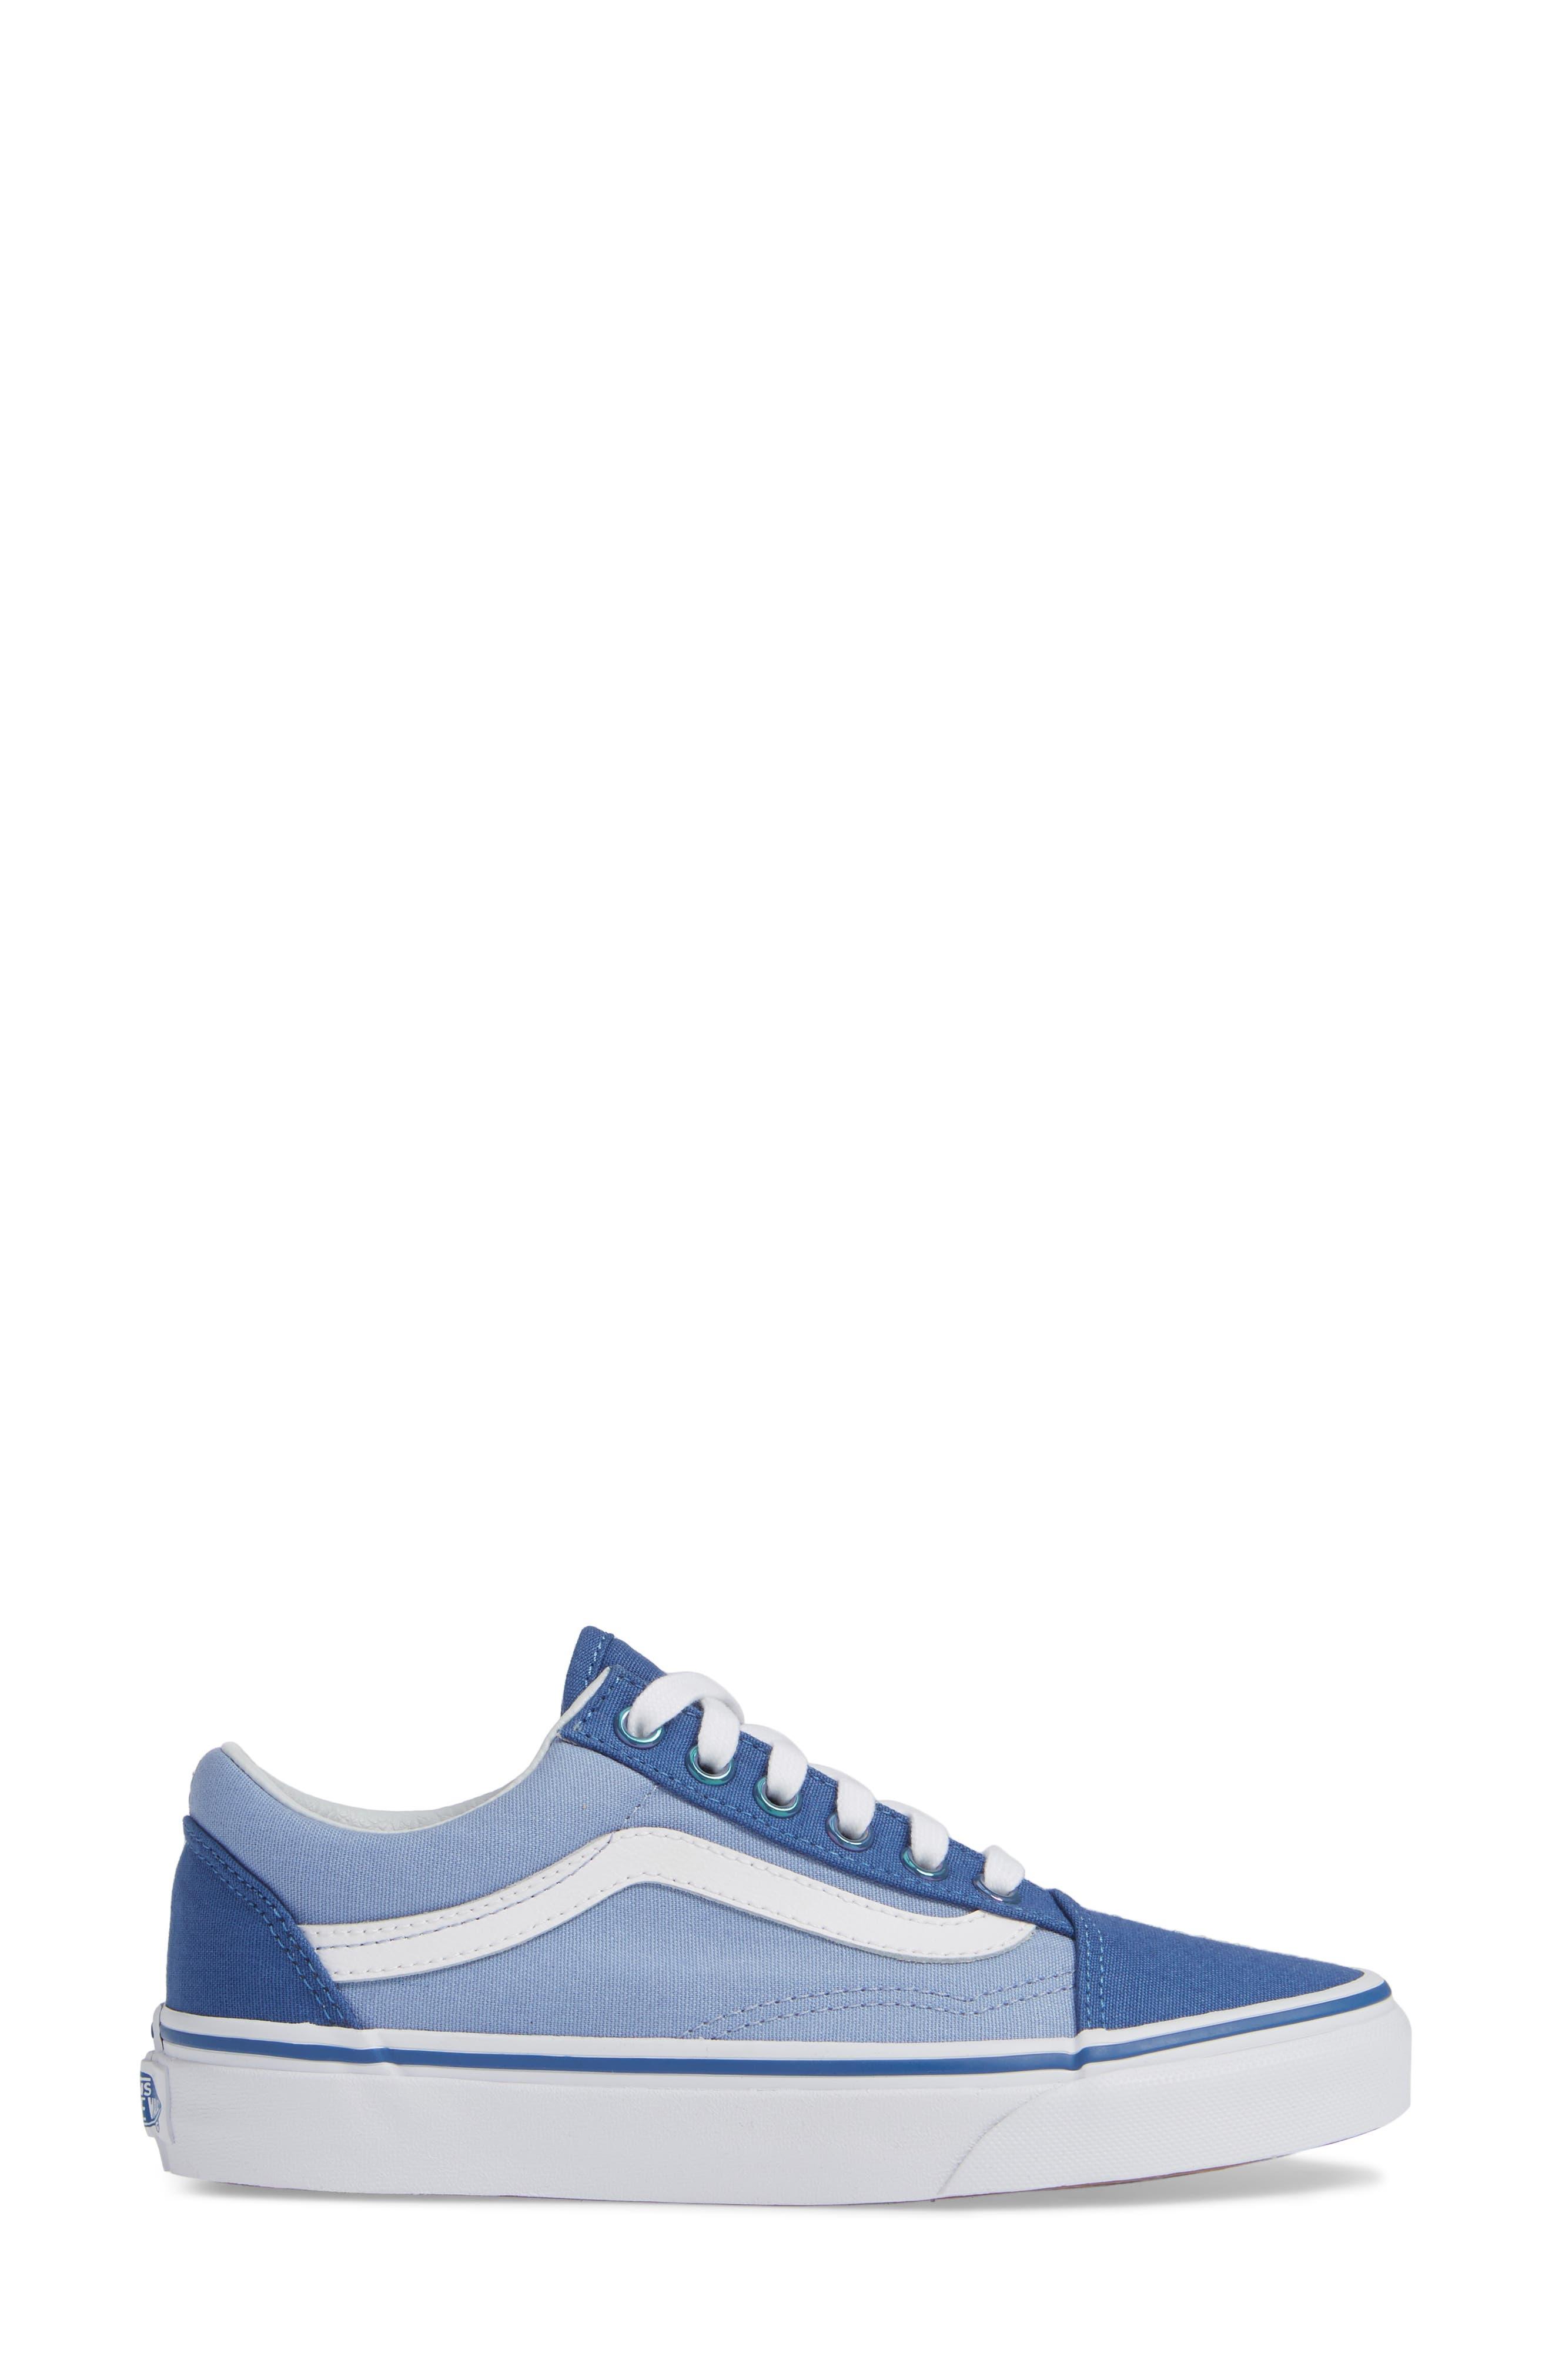 Old Skool Sneaker,                             Alternate thumbnail 3, color,                             FEDERAL BLUE/ LAVENDER LUSTER